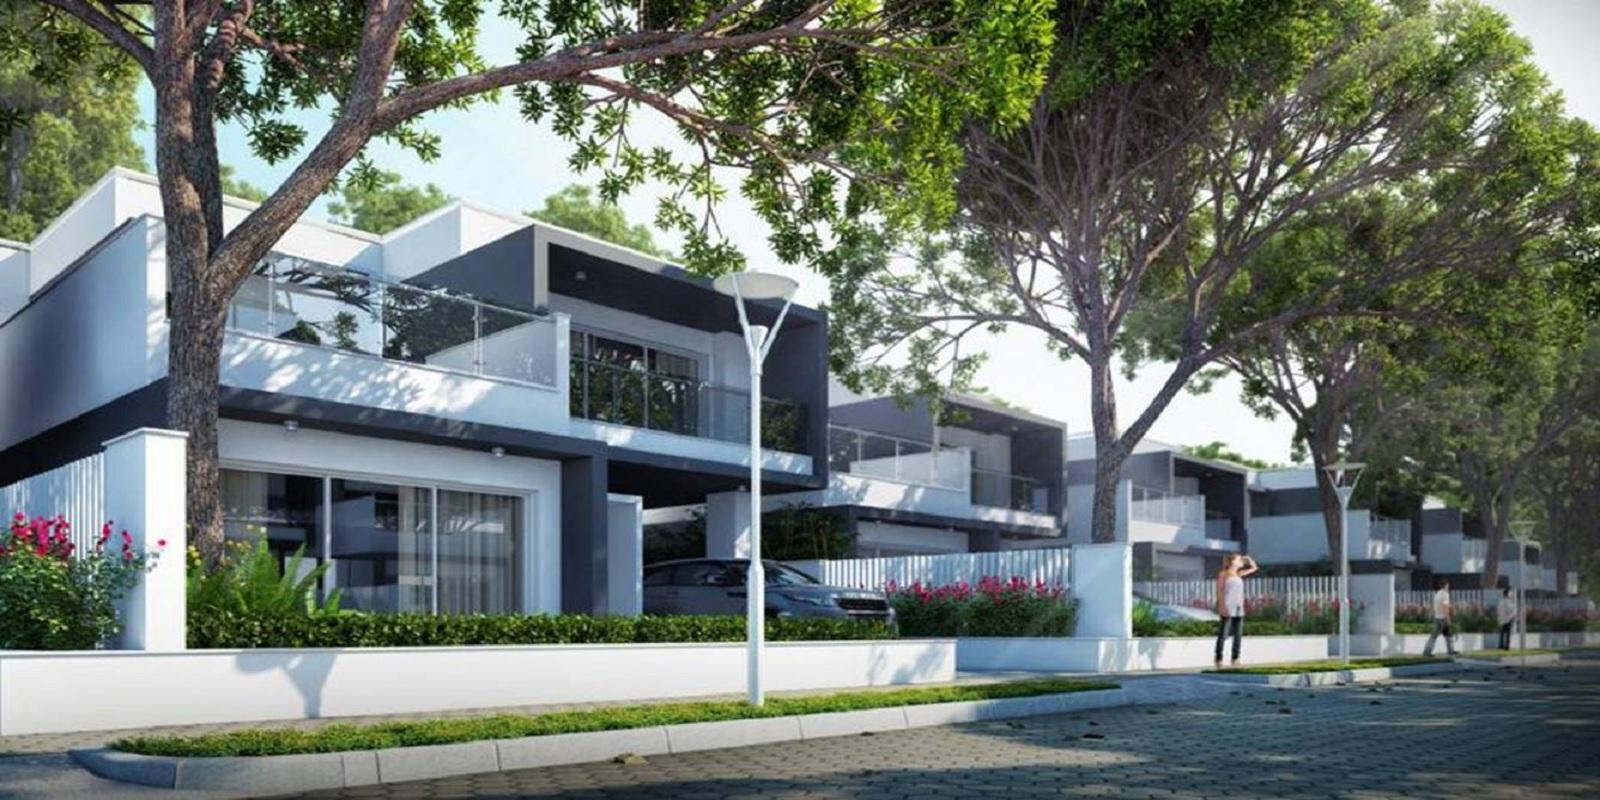 sobha silicon oasis rowhouses project large image5